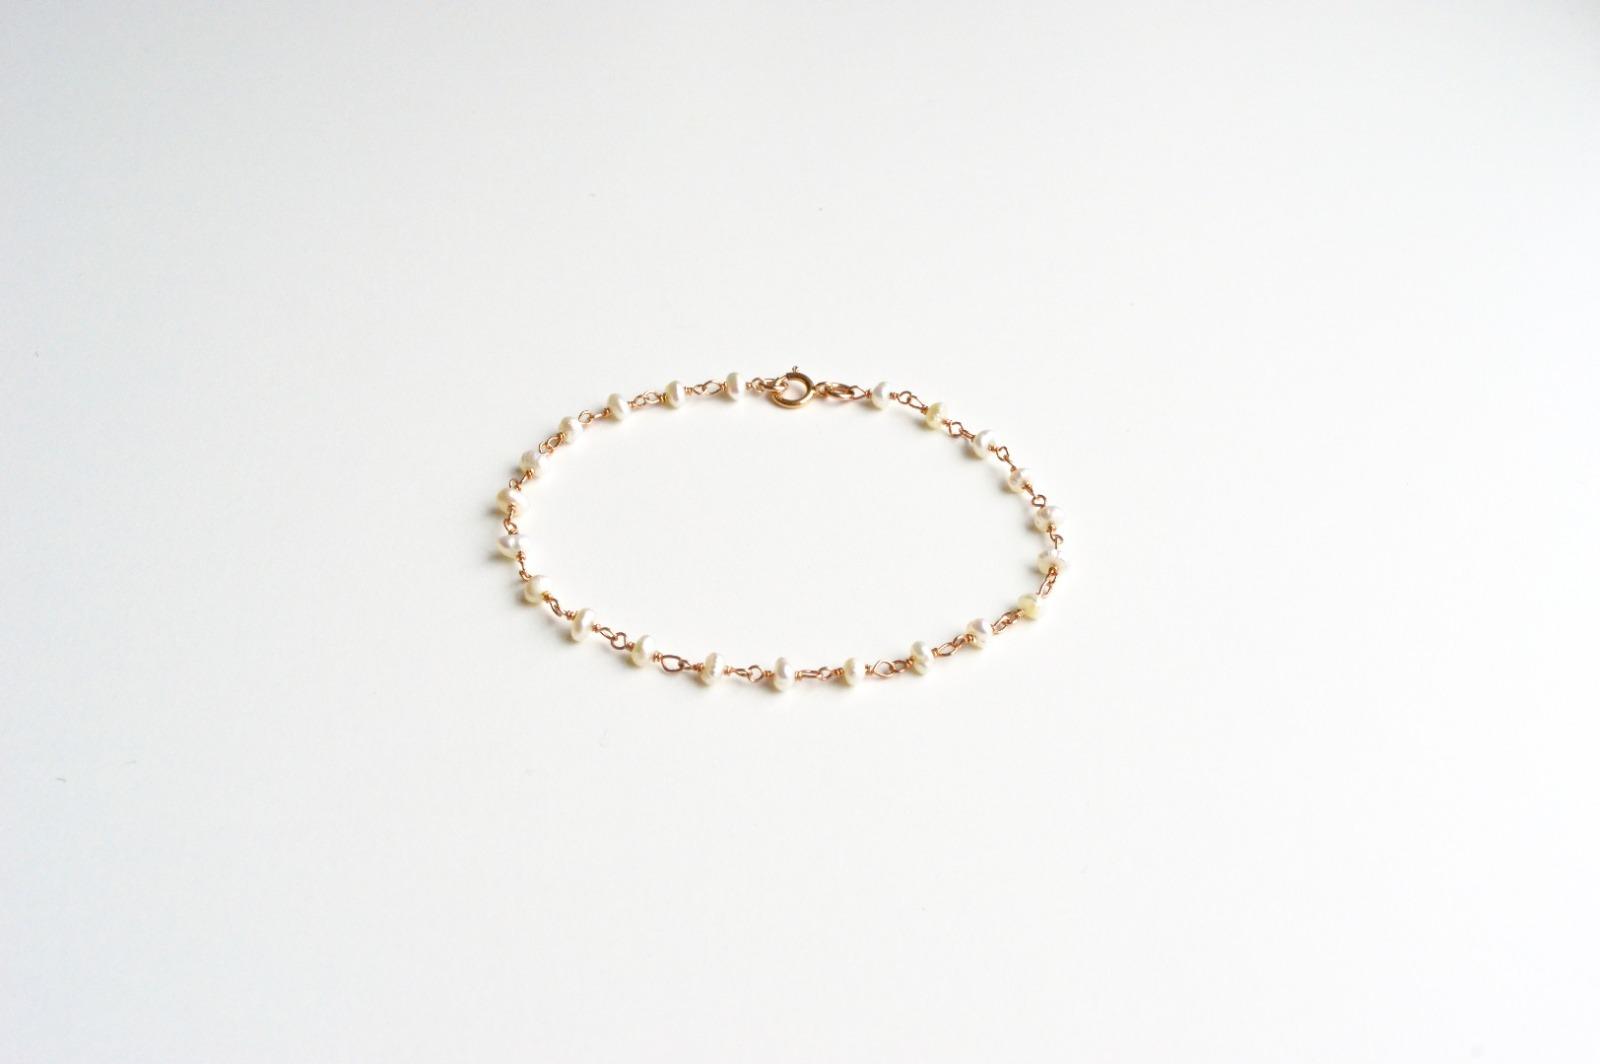 Reizend Zartes Perlen Armband ros vergoldet